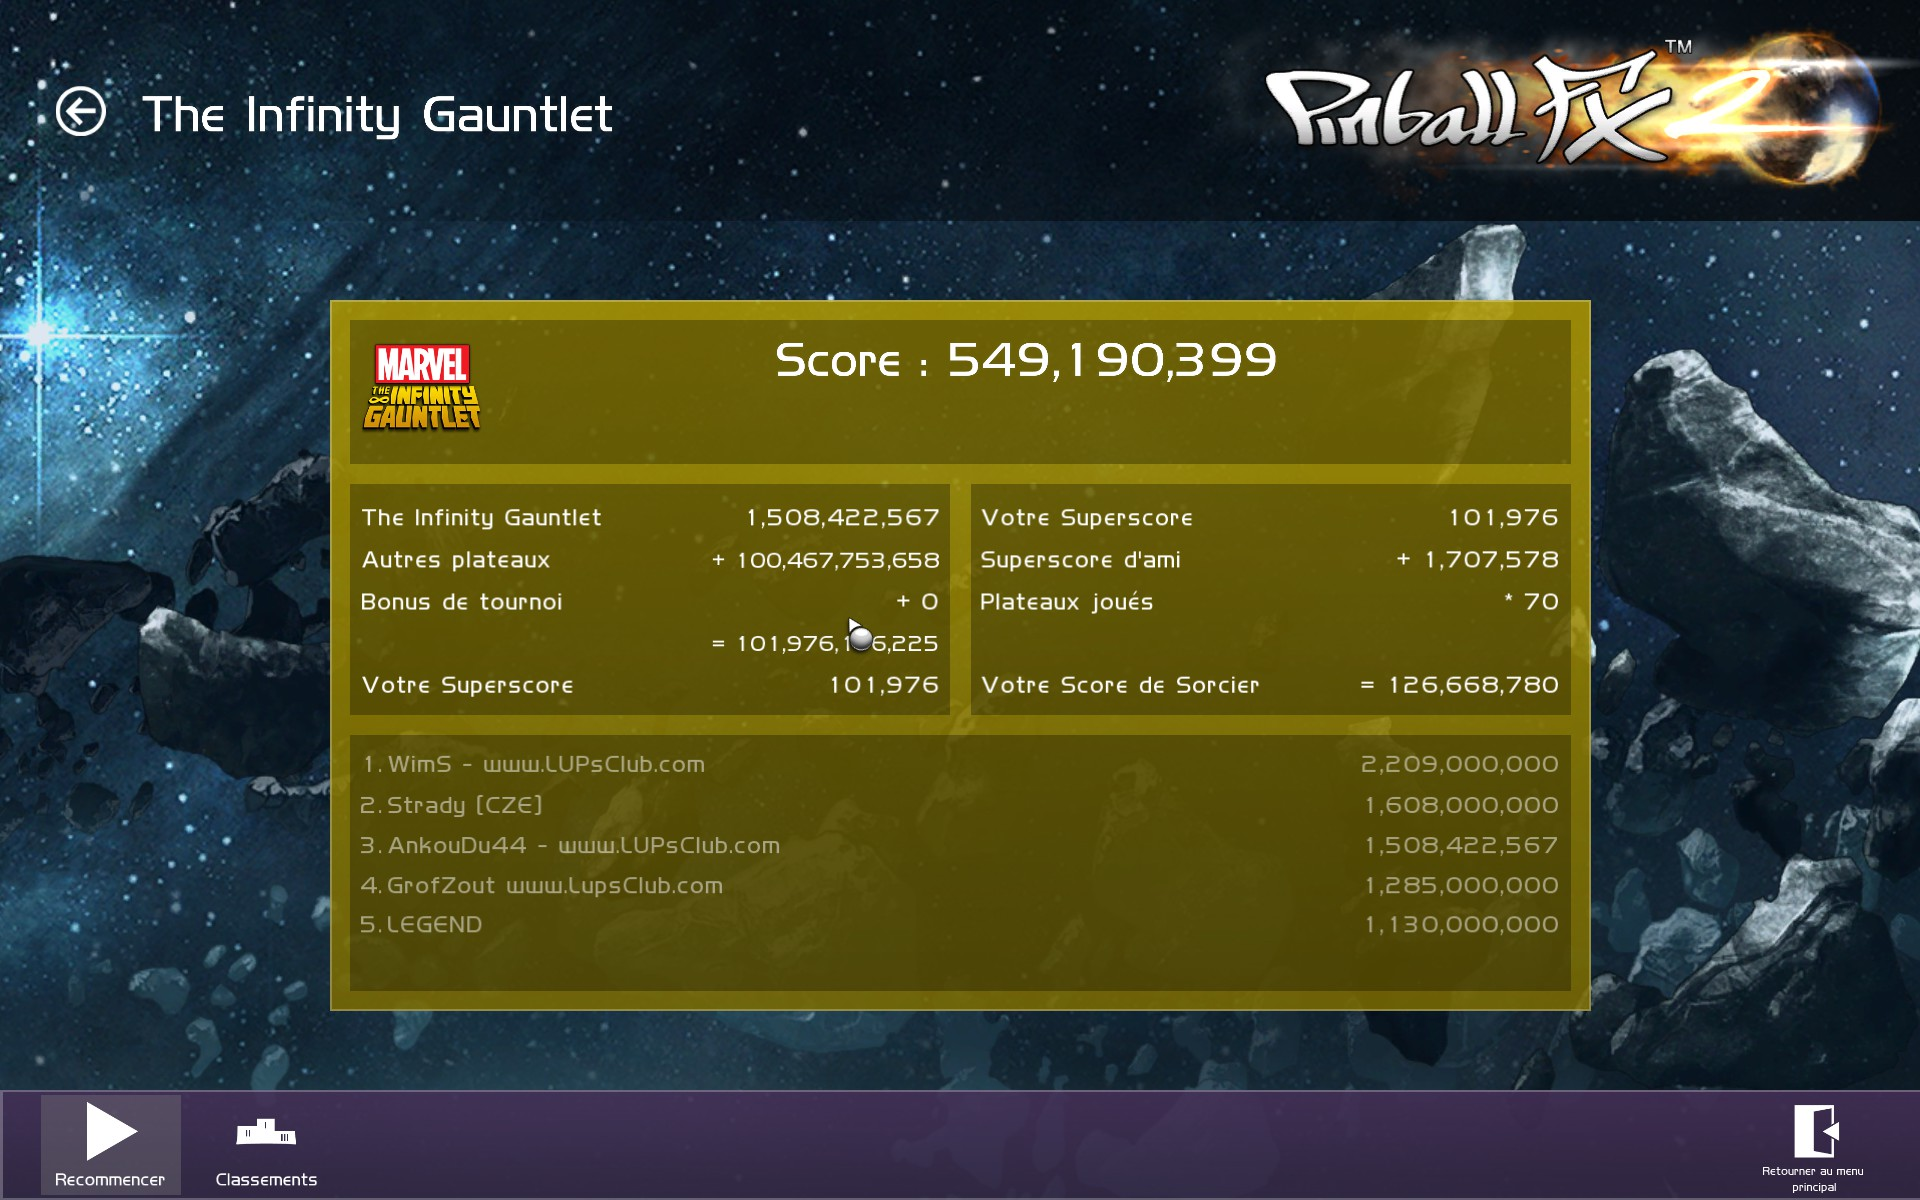 LUP's Club TdM 08.17 : The Infinity Gauntlet 9FCD0E73ED41E9550434C6EE6EF4EC8D4A8A58C2